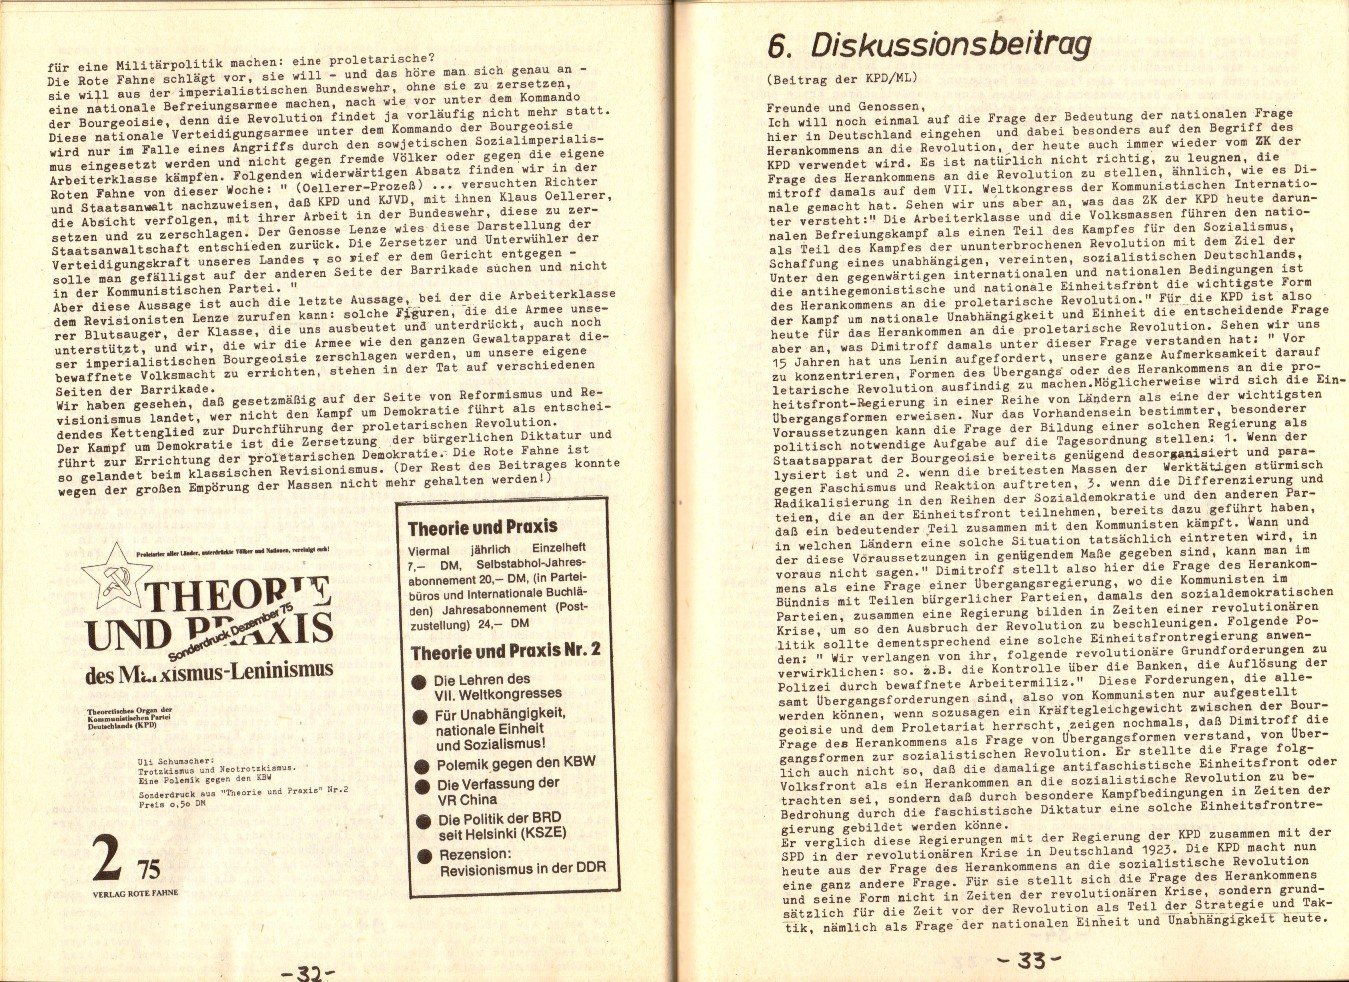 Berlin_AO_1976_Veranstaltung_mit_KPDML_17